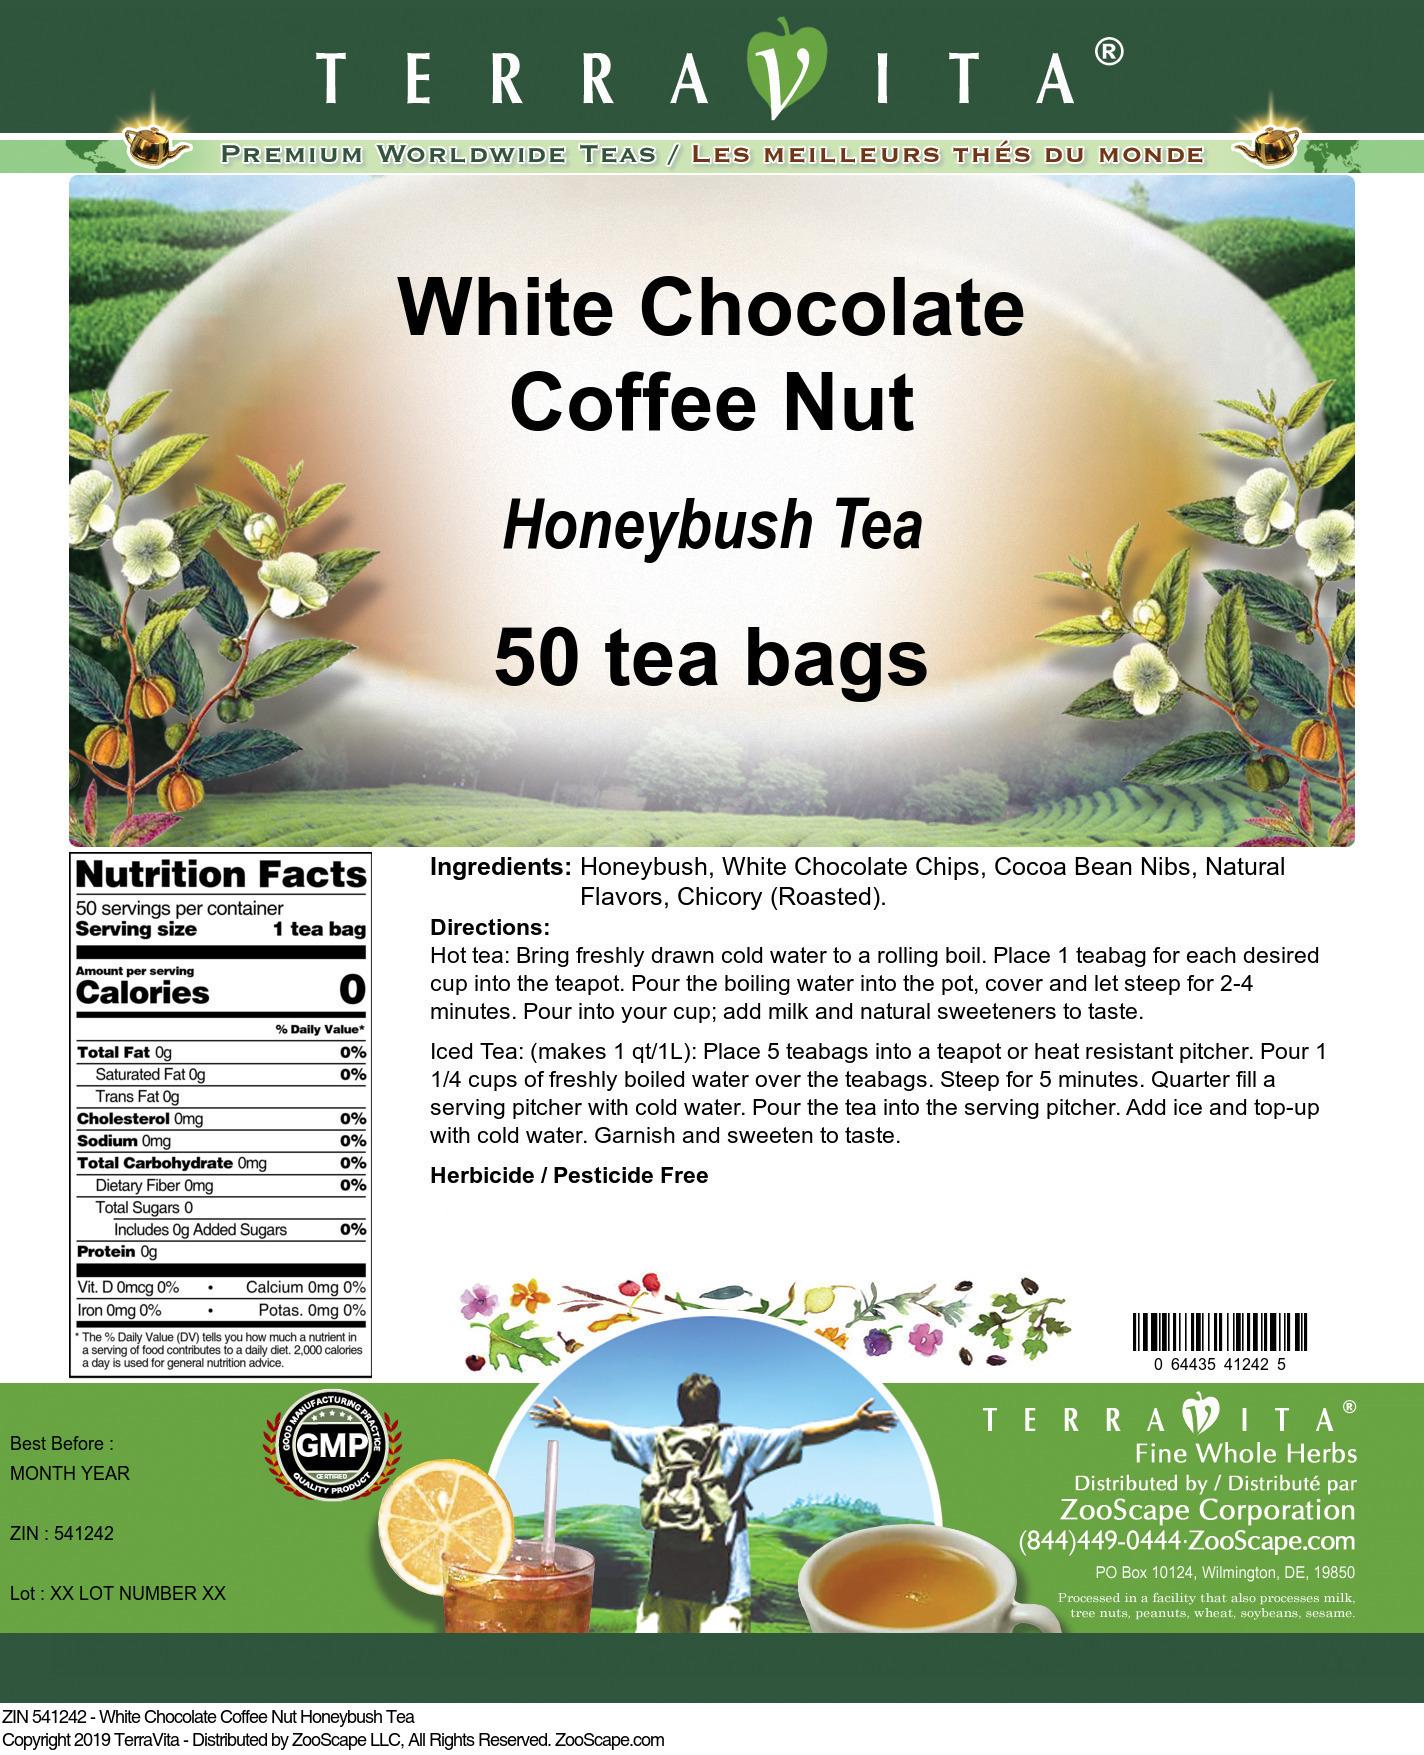 White Chocolate Coffee Nut Honeybush Tea